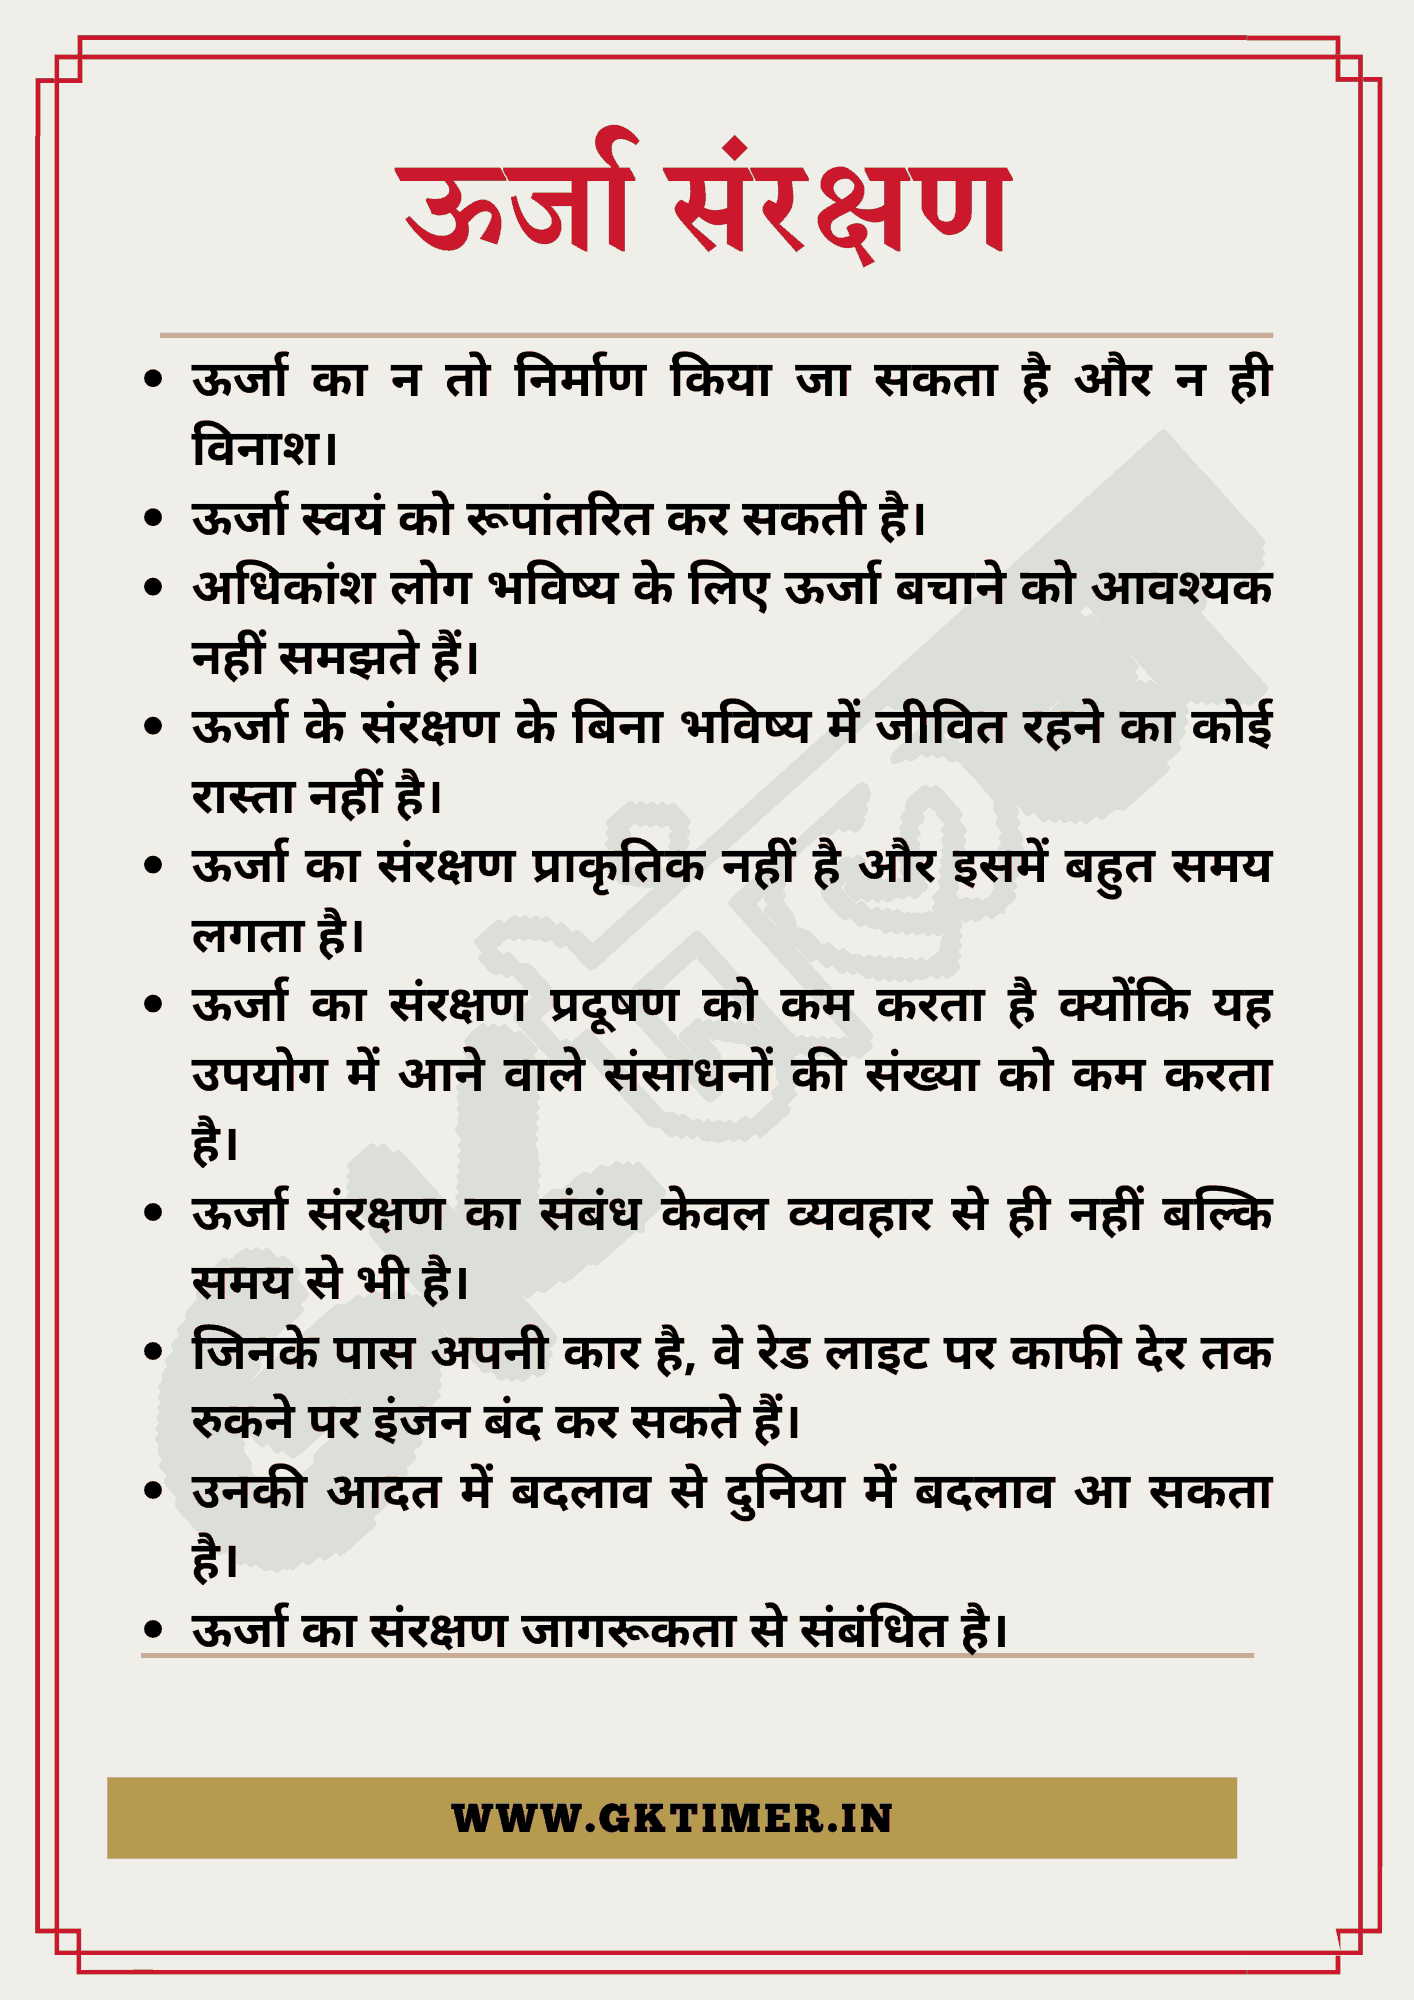 ऊर्जा संरक्षण पर  निबंध | Essay on Energy Conservation in Hindi | 10 Lines on Energy Conservation in Hindi